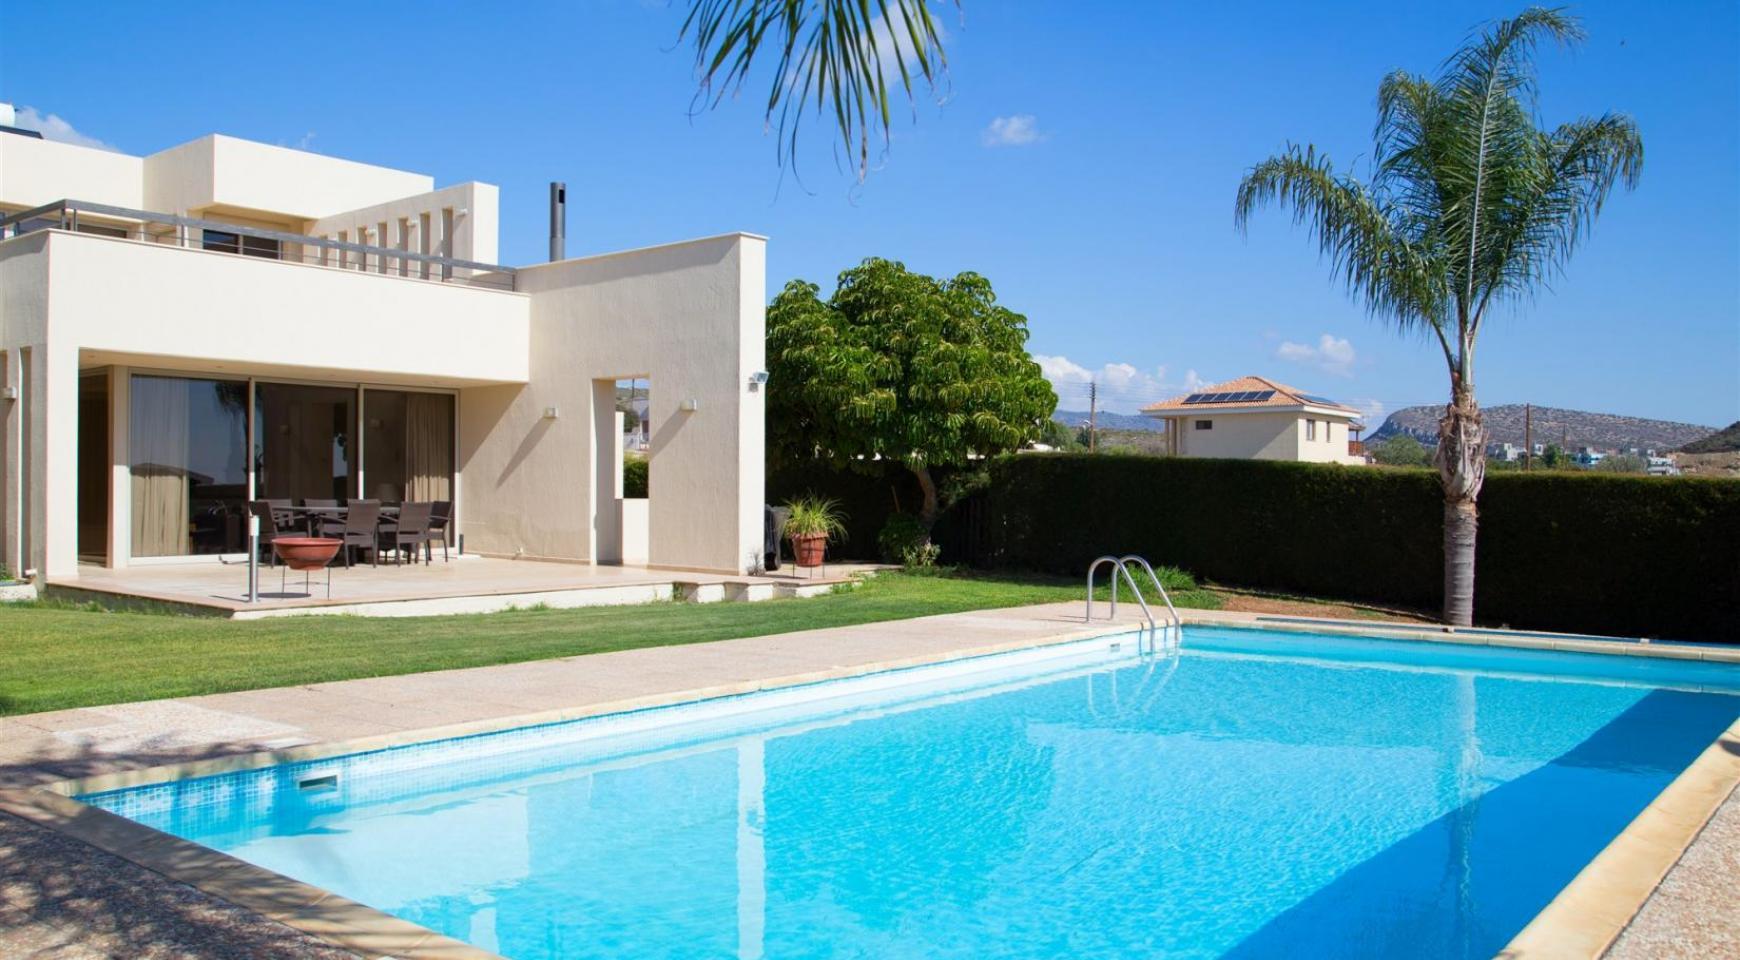 Modern Luxury 4 Bedroom Villa in Sfalagiotisa, Agios Athanasios - 4